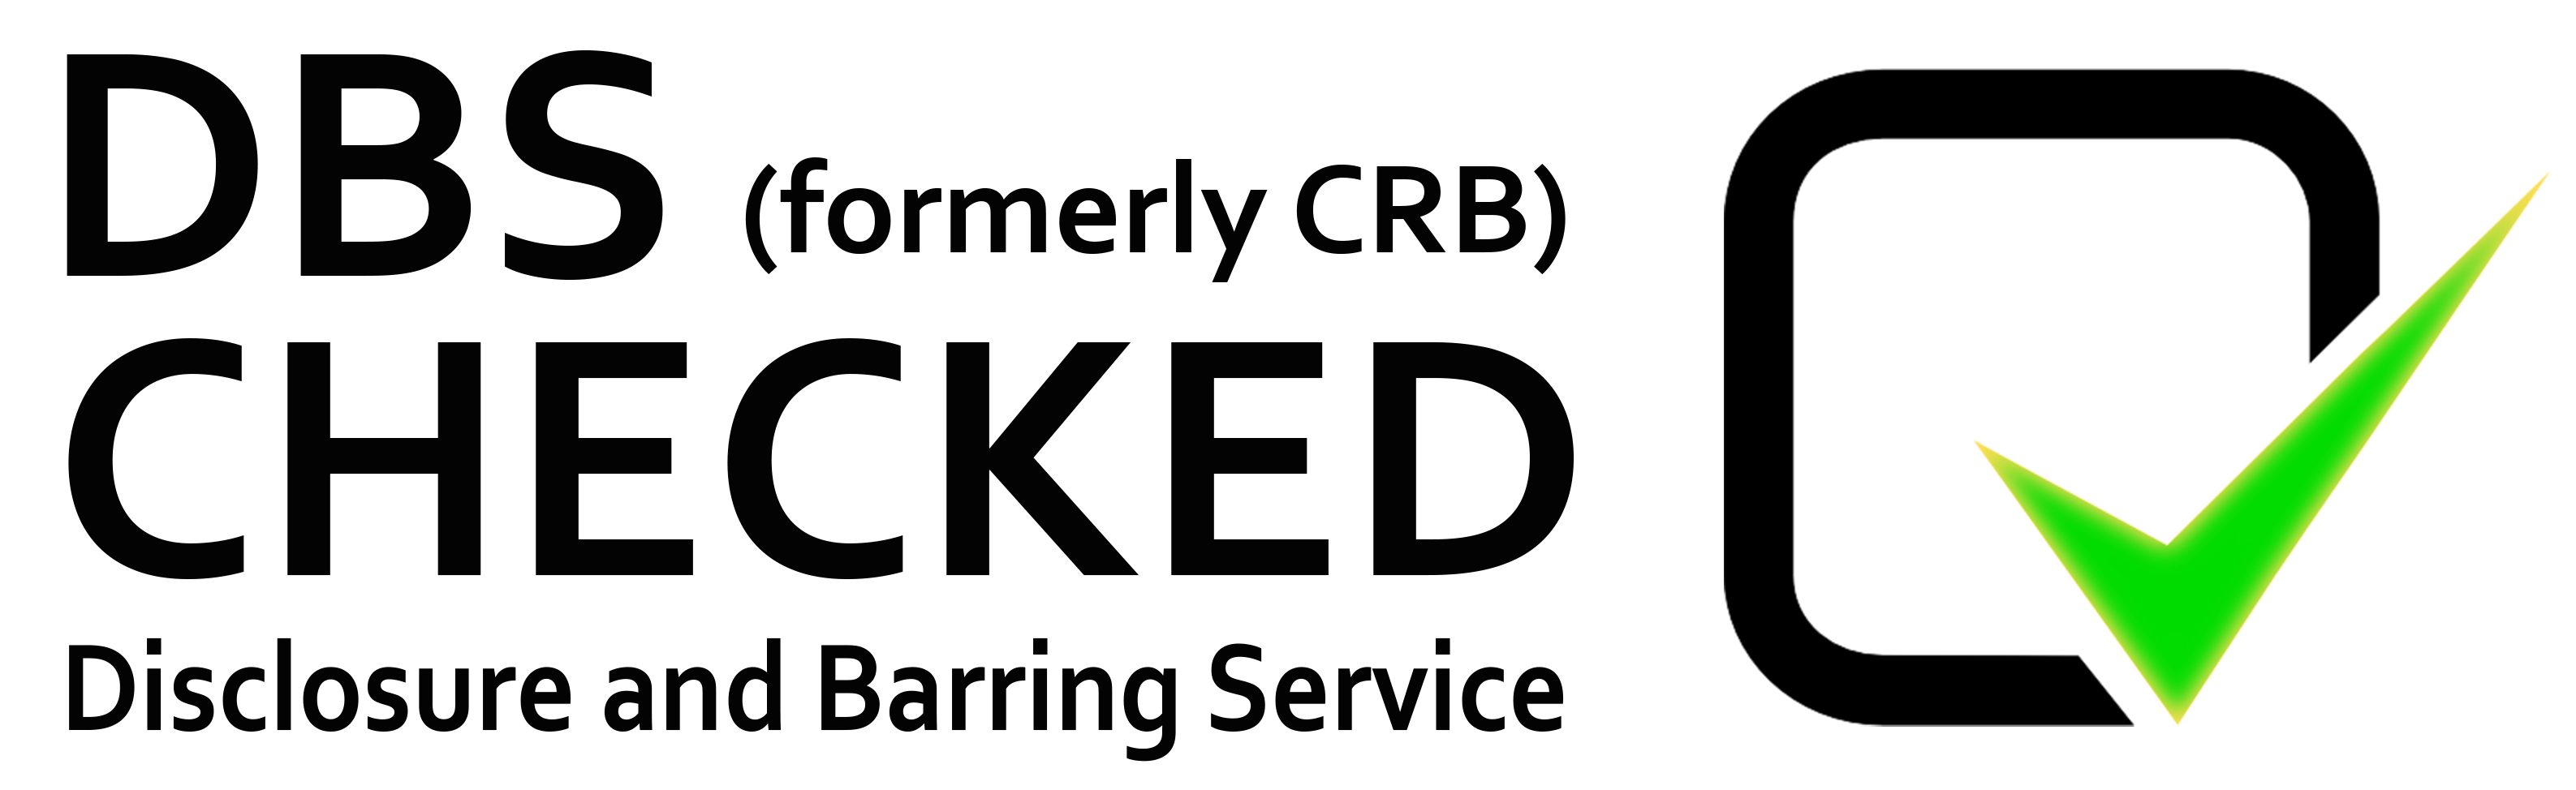 Logo Dbs PNG - 34288